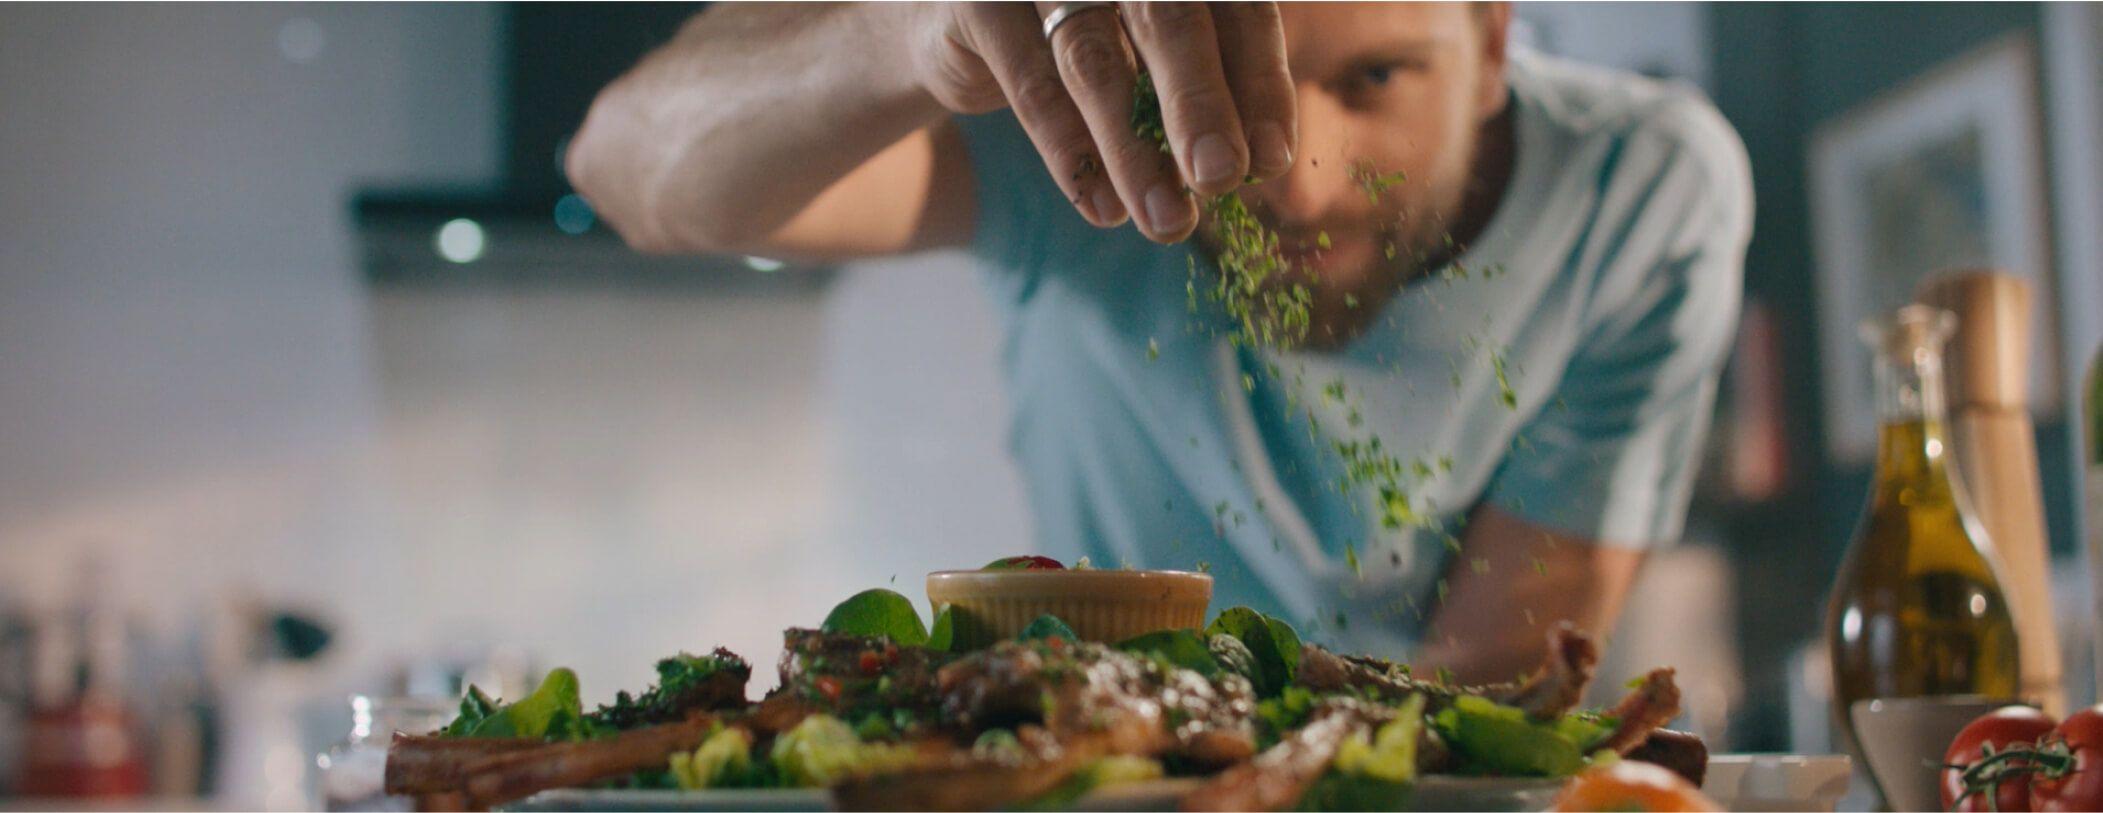 Enjoy Cooking With KitchenAid Appliances